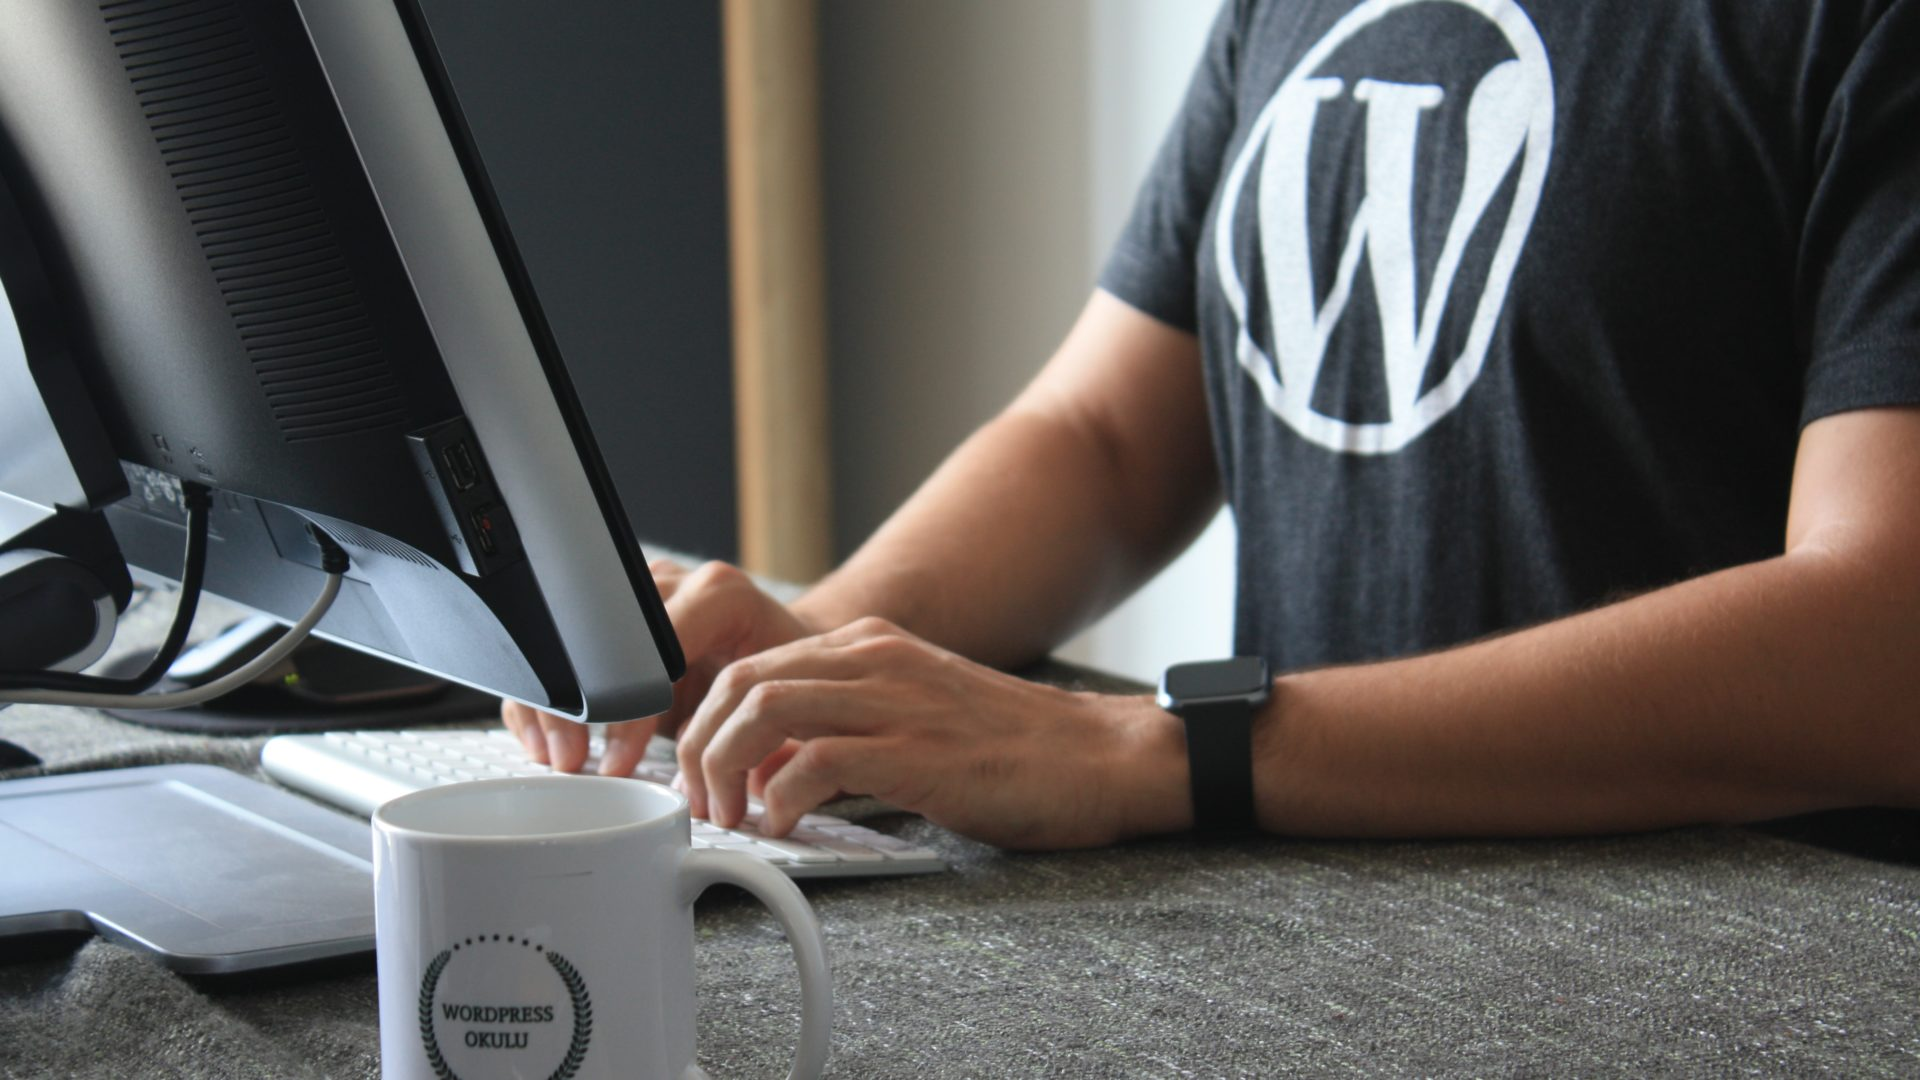 Logotyp Wordpress